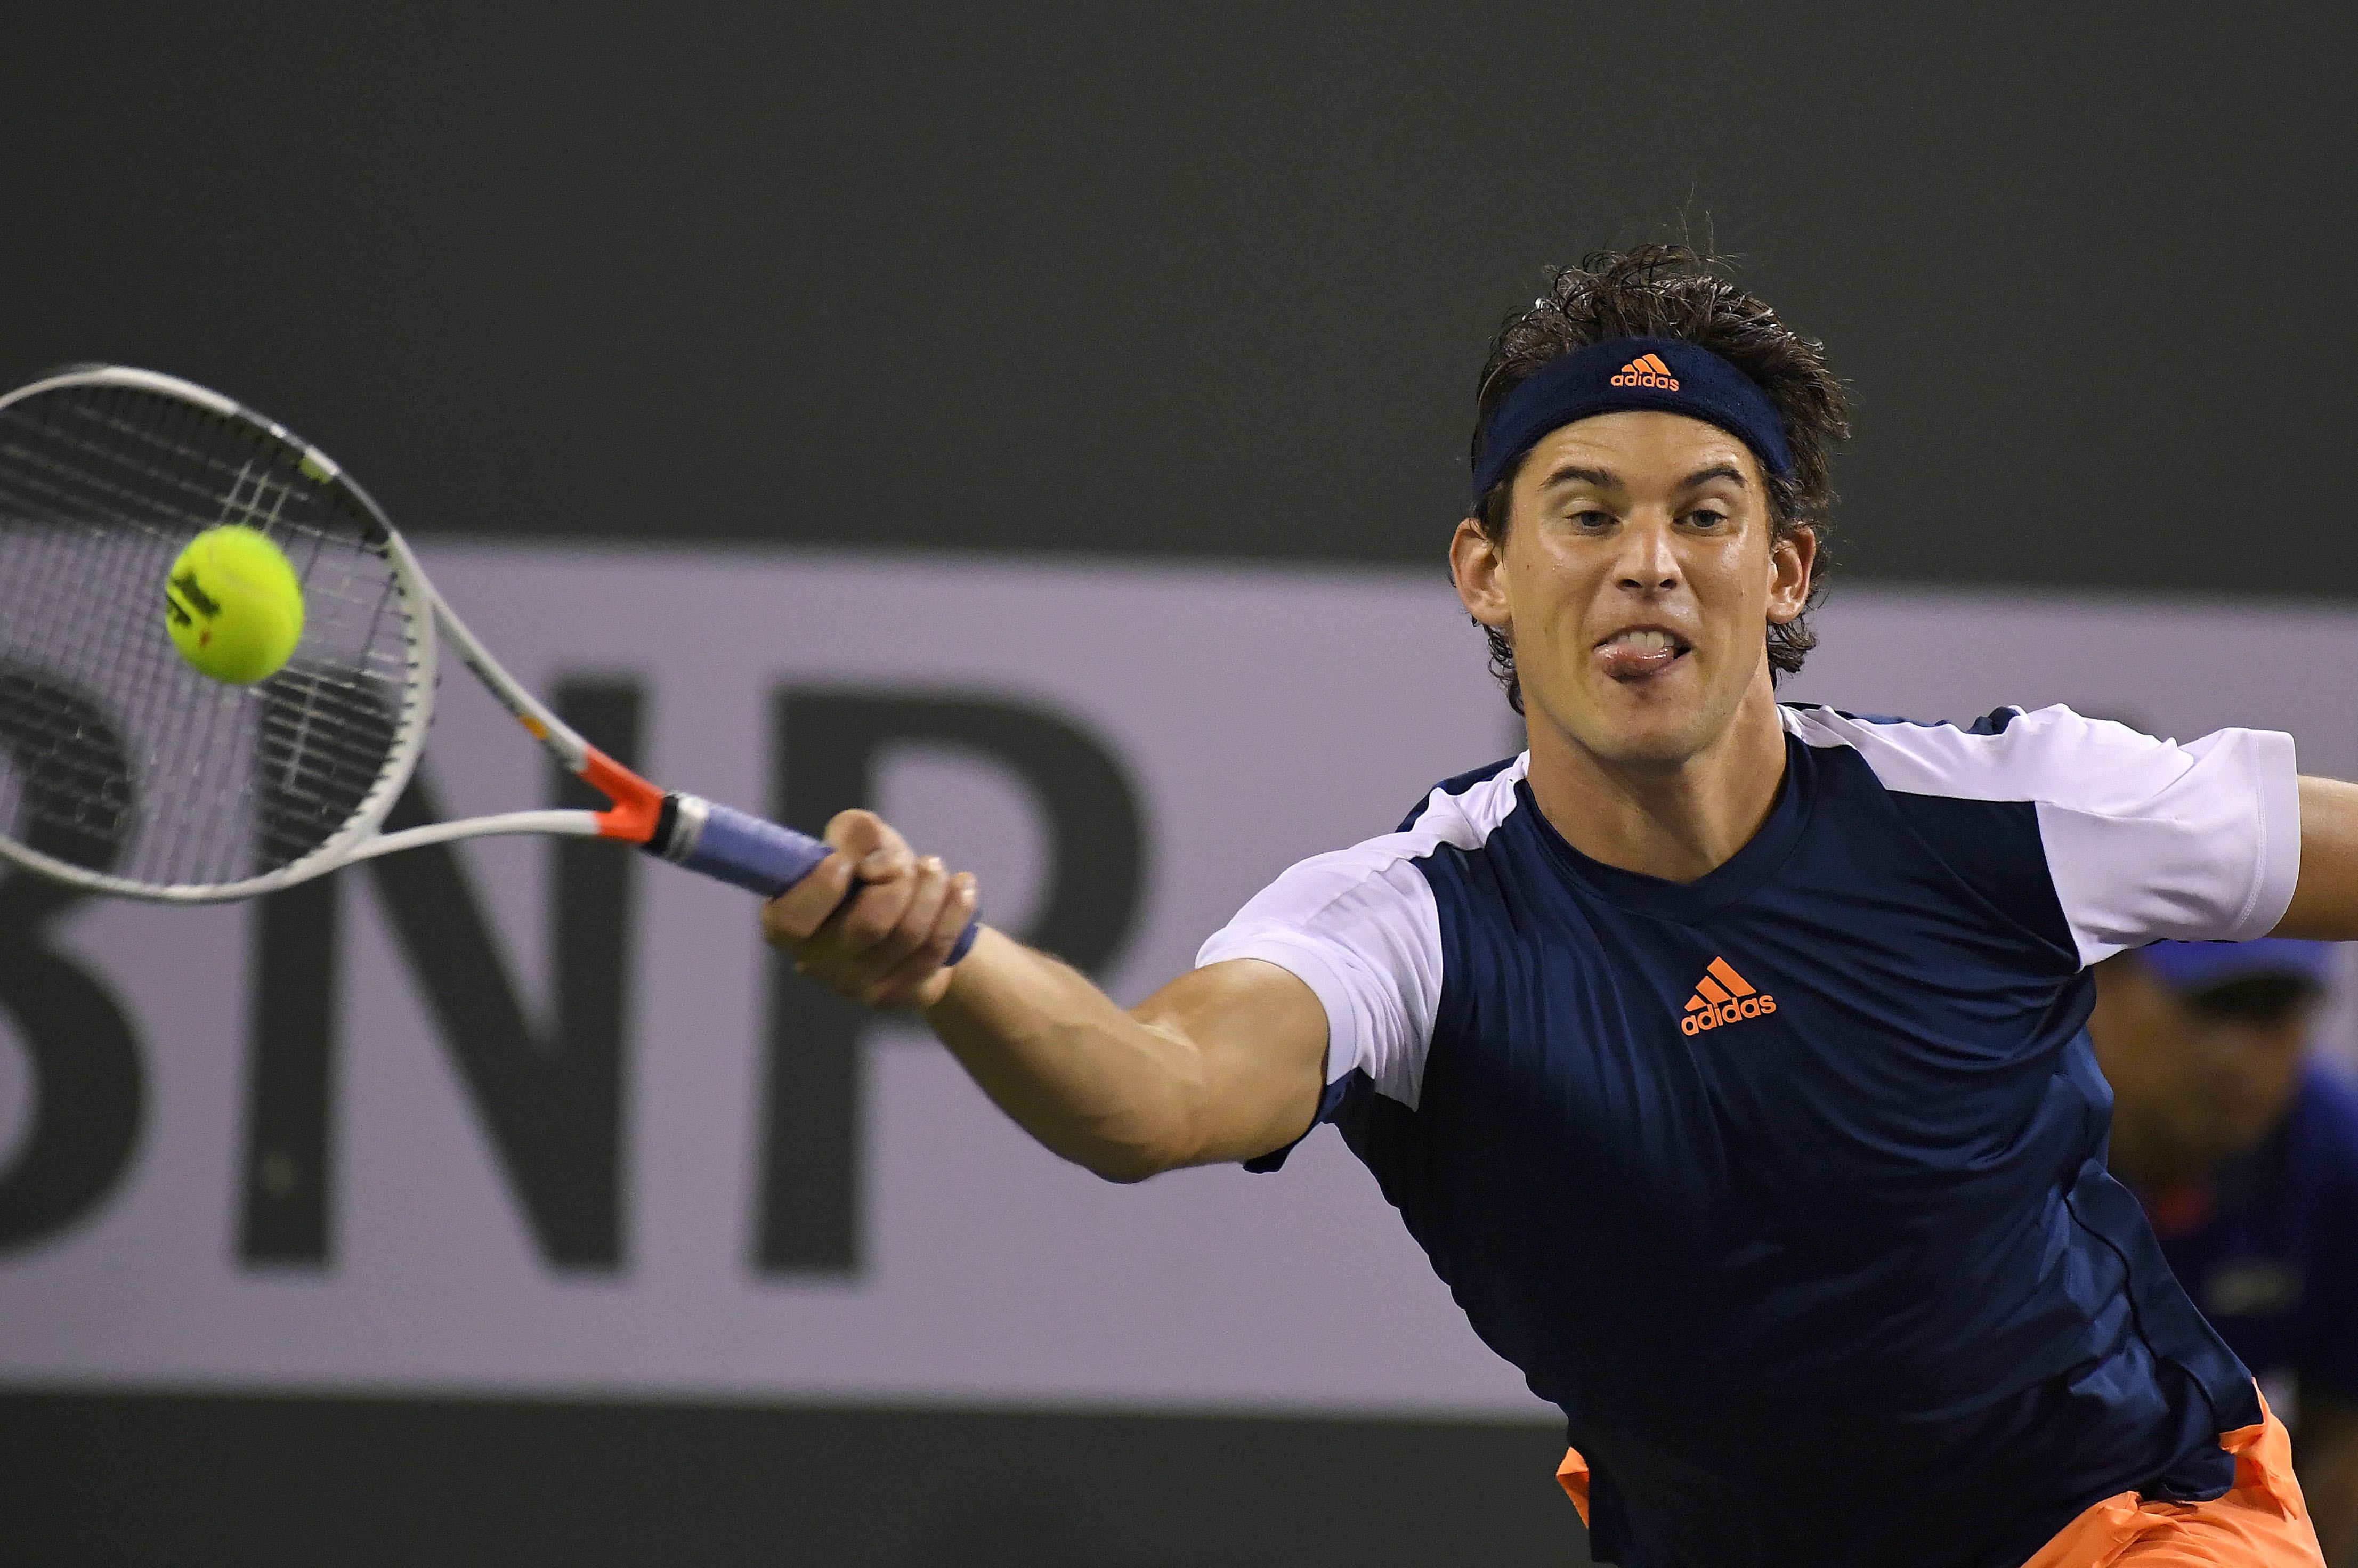 Dominic Thiem, of Austria, returns a shot to Stanislas Wawrinka, of Switzerland, at the BNP Paribas Open tennis tournament, Thursday, March 16, 2017, in Indian Wells, Calif. (AP Photo/Mark J. Terrill)